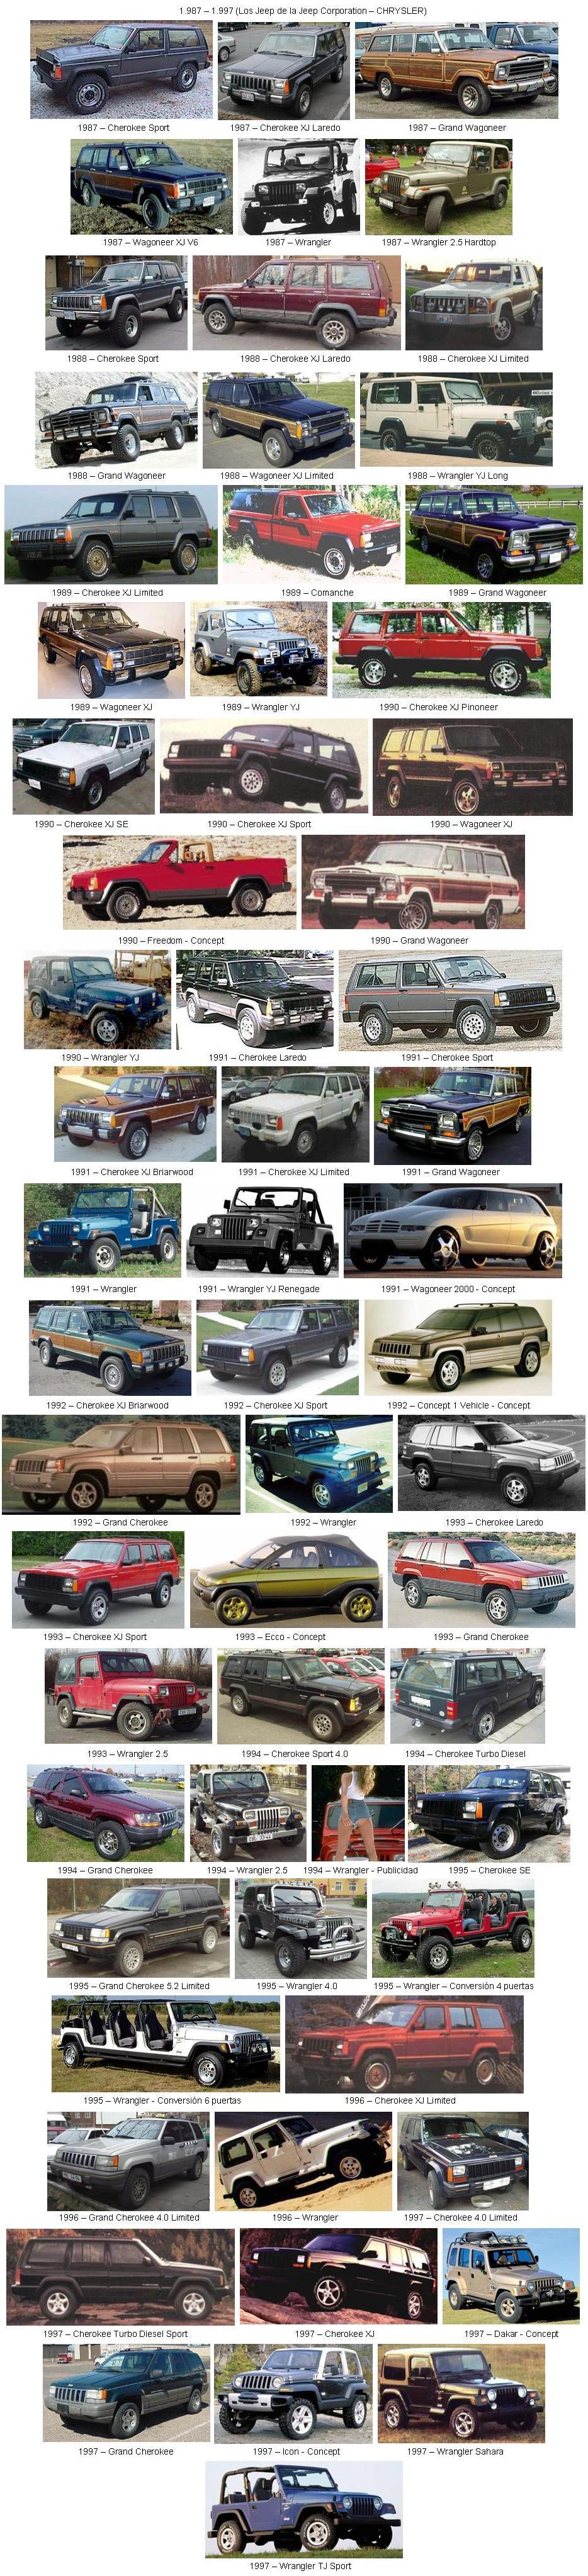 Historia Gráfica de la Jeep JEEP-06-(1987-1997)-(Jeep%20Corporation%20-%20Chrysler)